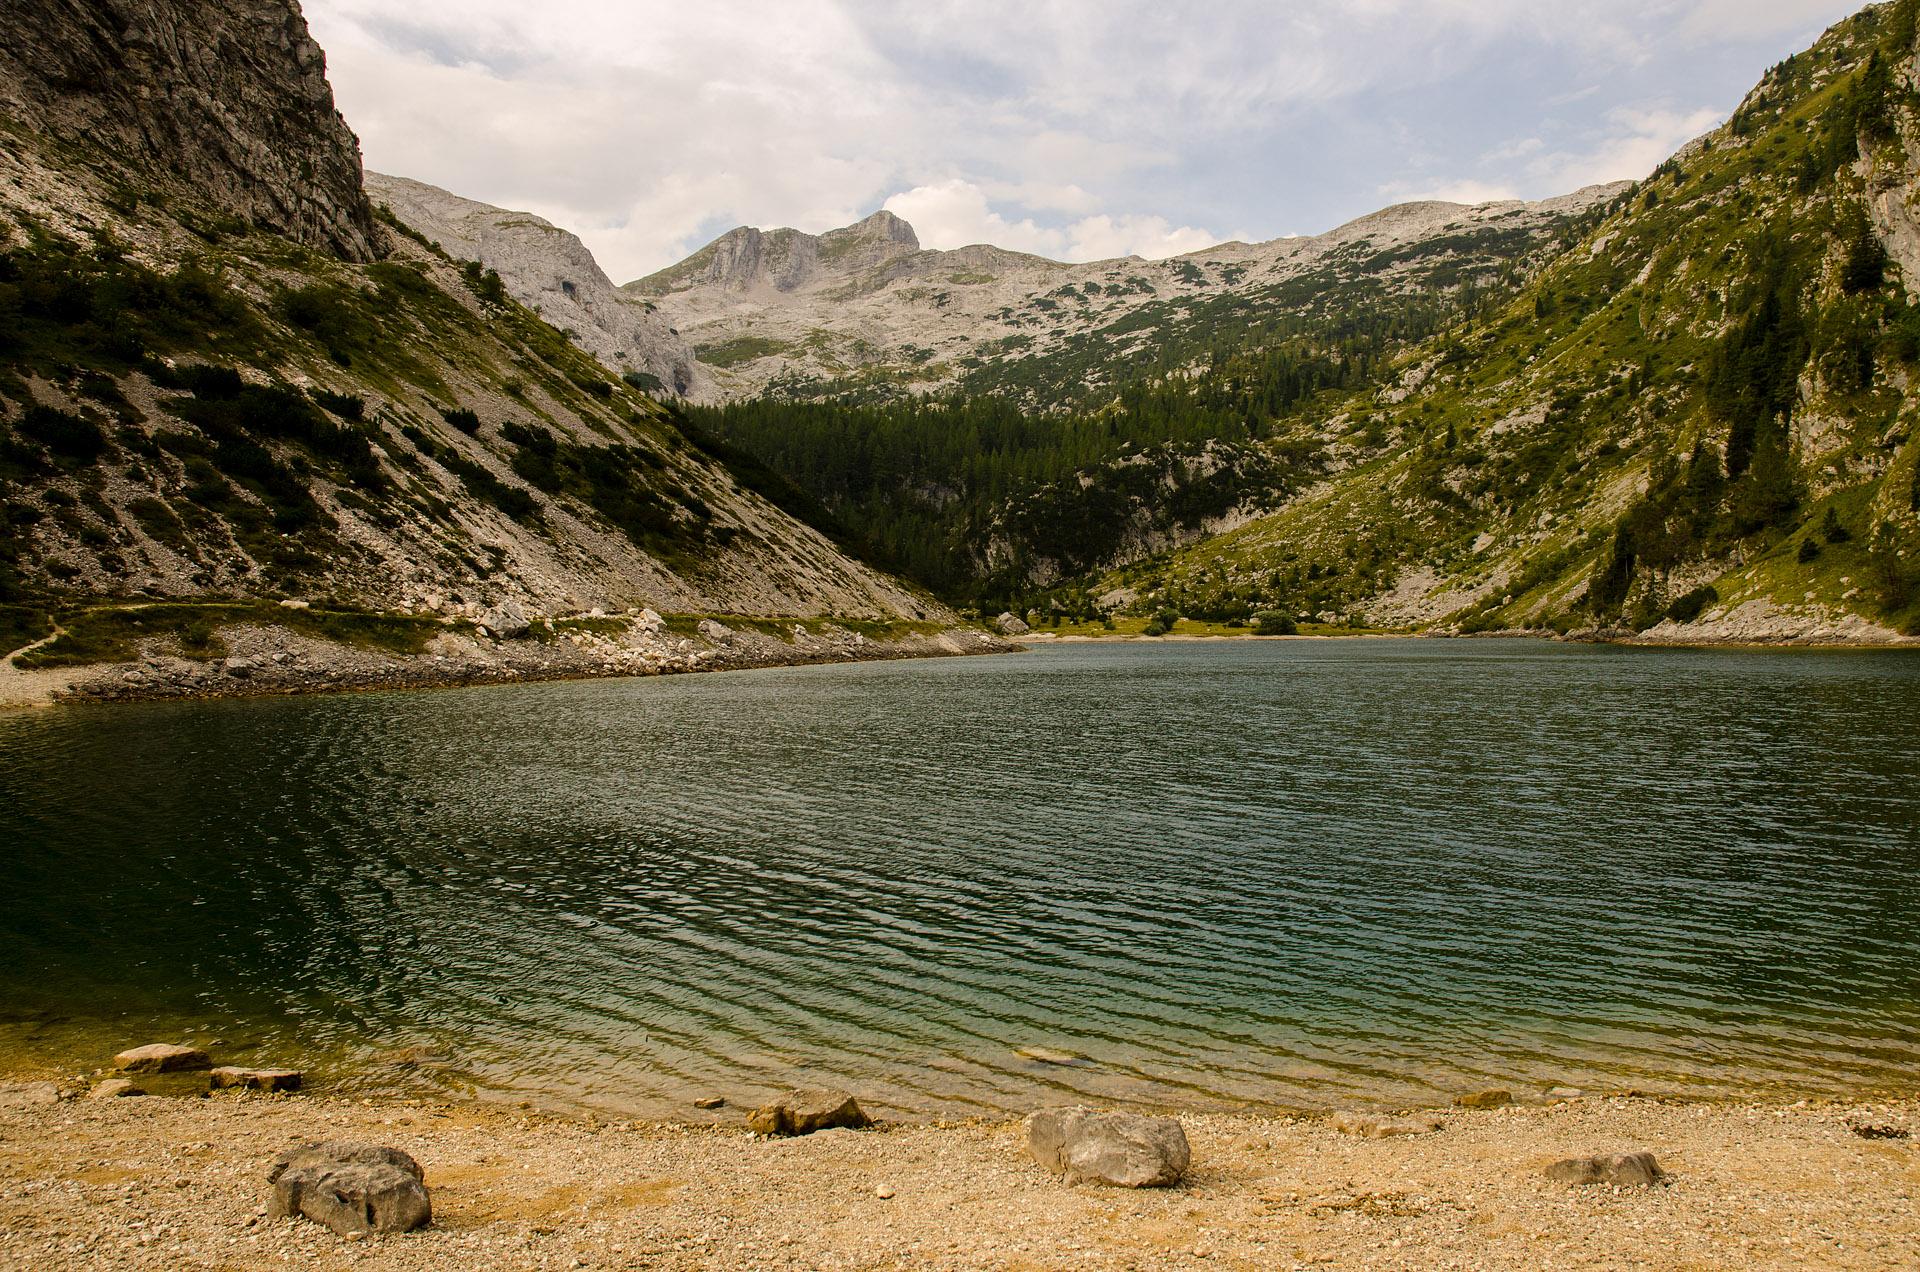 Krn Lake (Krnsko Jezero)